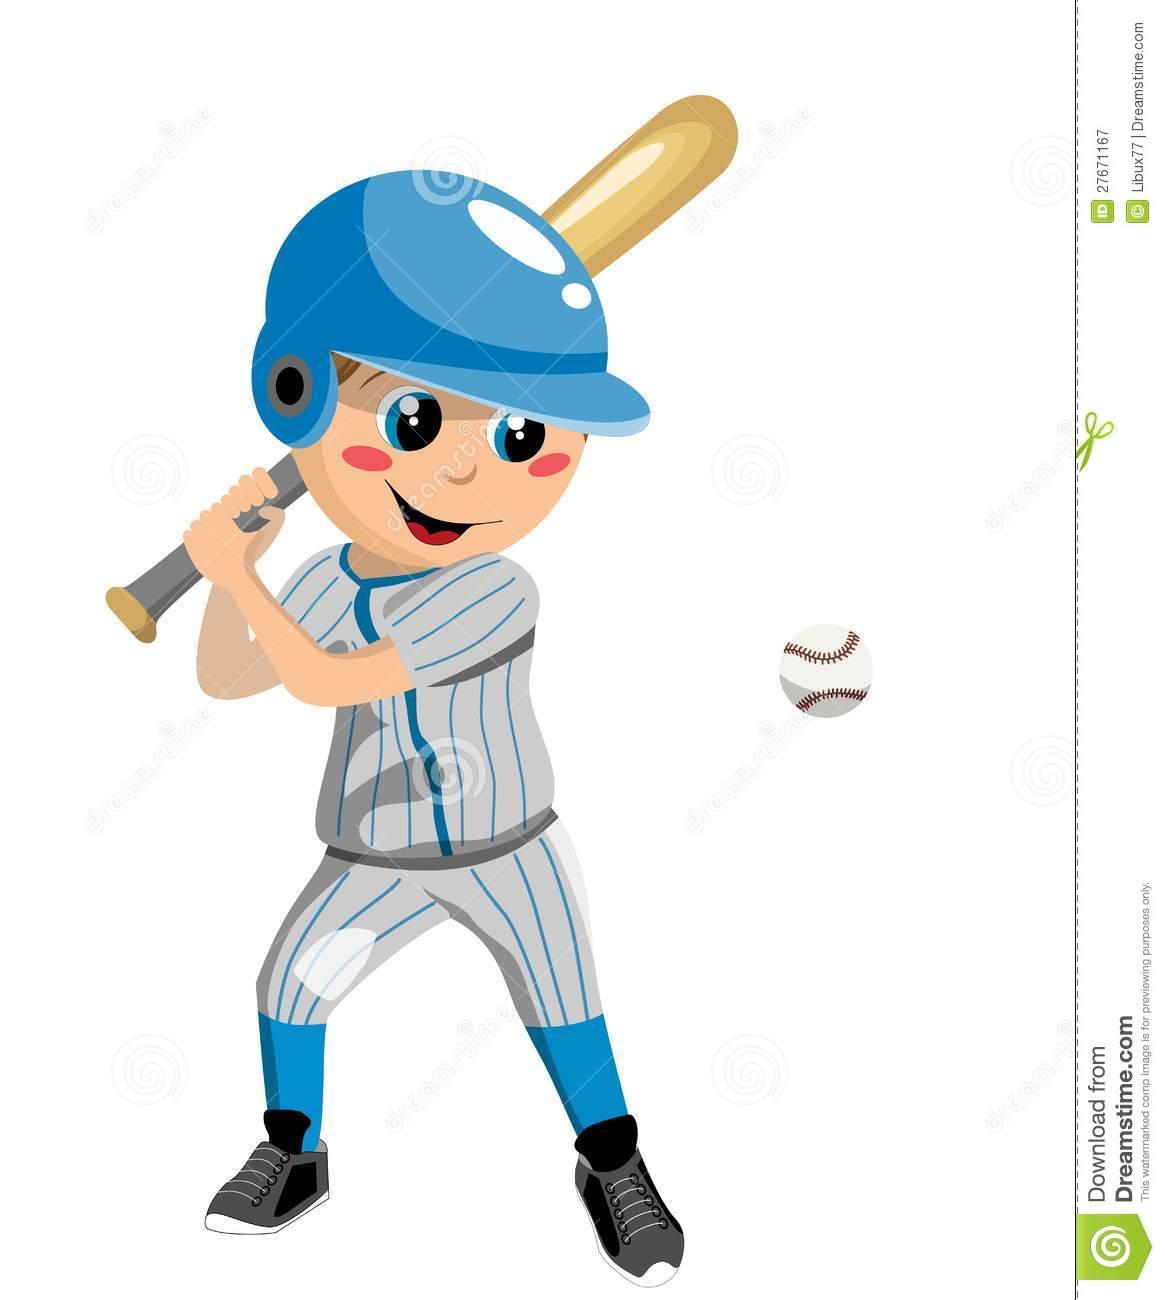 Boy Baseball Player Clipart - Clipart Kid